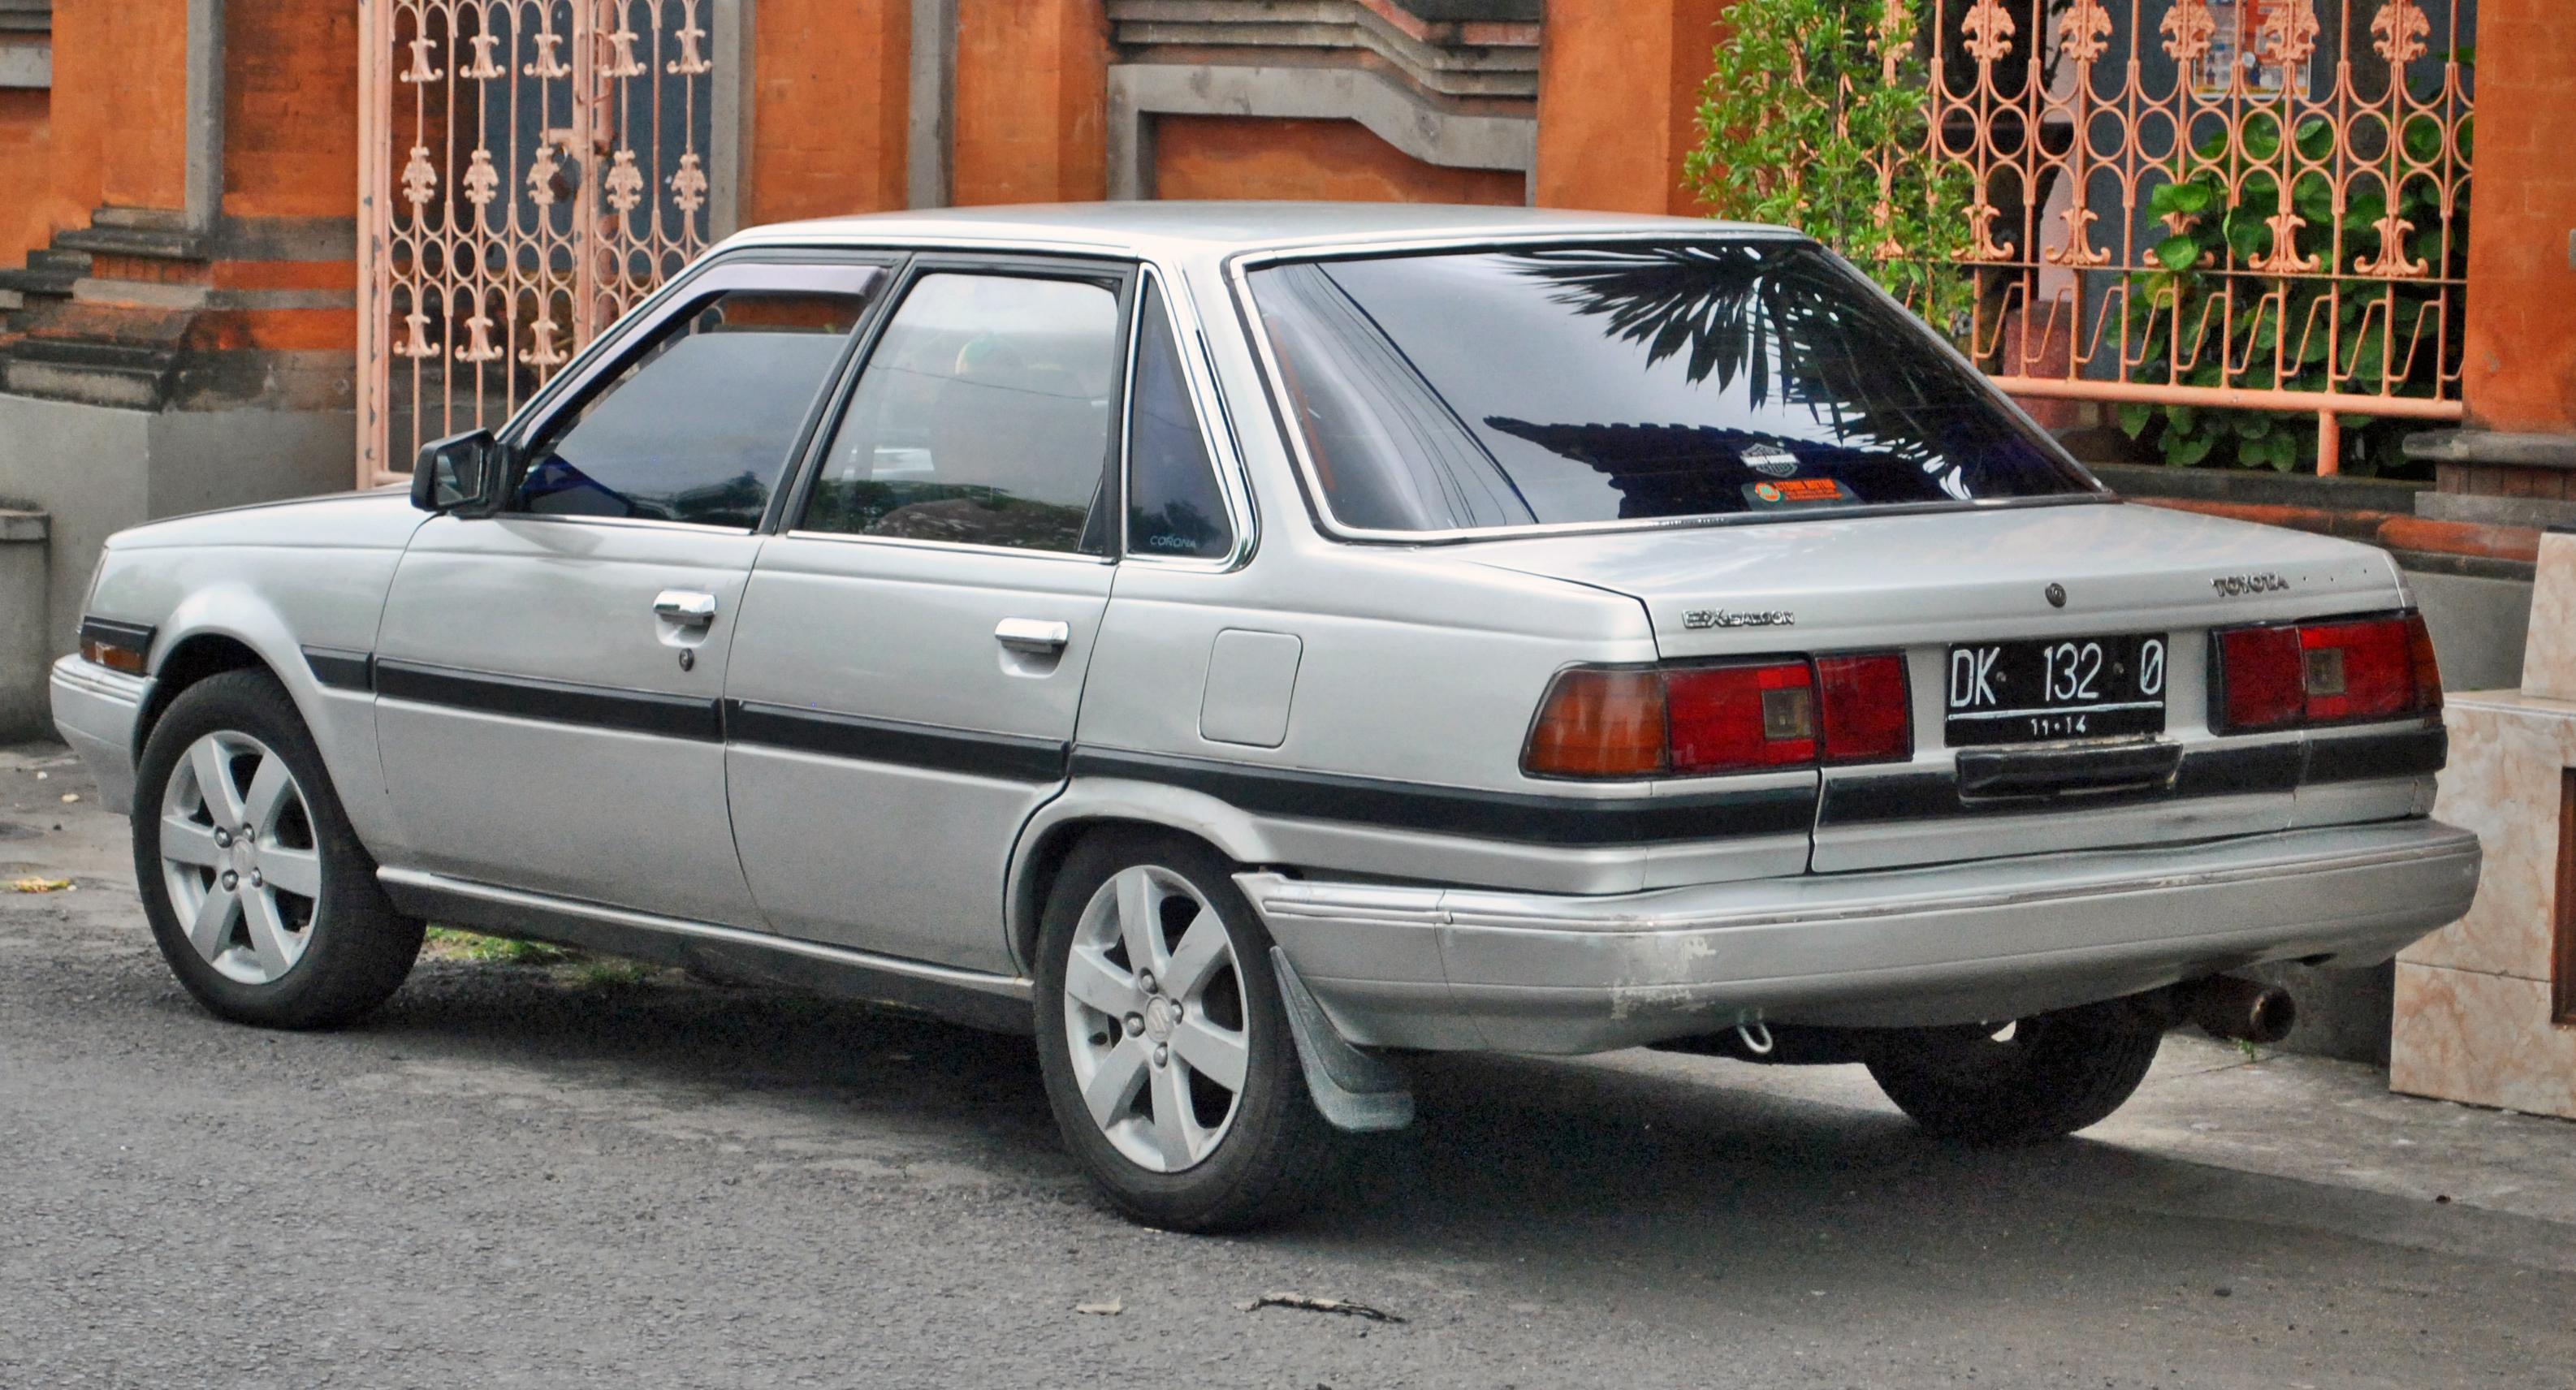 Toyota Carina ED I (T160) 1985 - 1989 Sedan-Hardtop #6